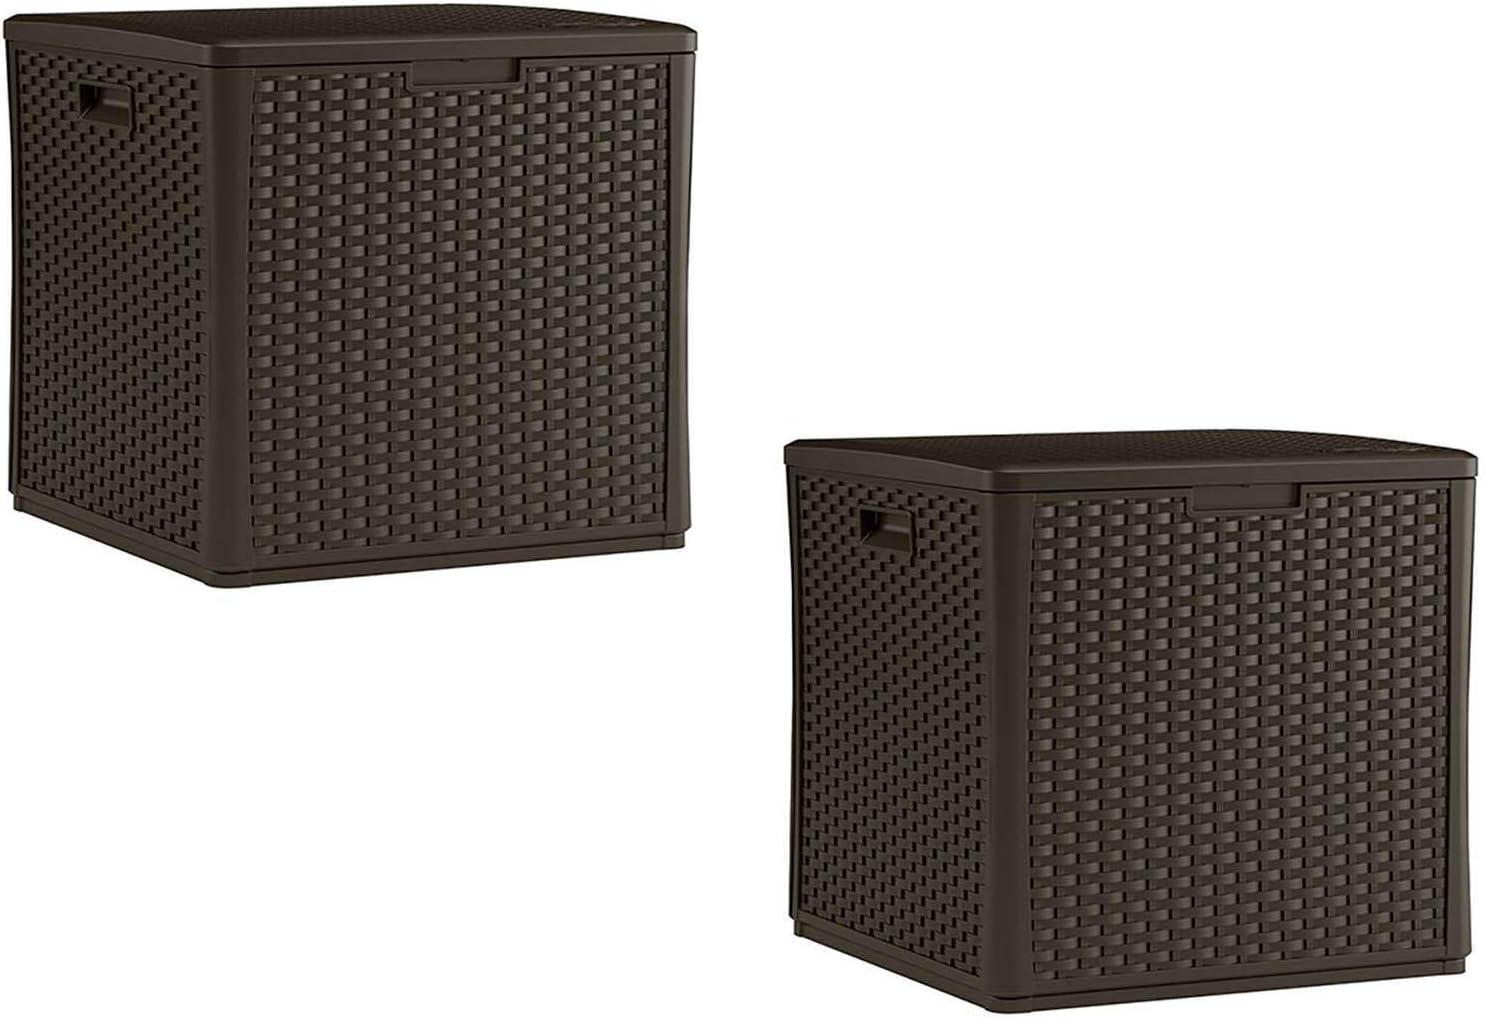 Suncast 60 Gallon Resin Wicker Design Cube Shape Storage Deck Bo